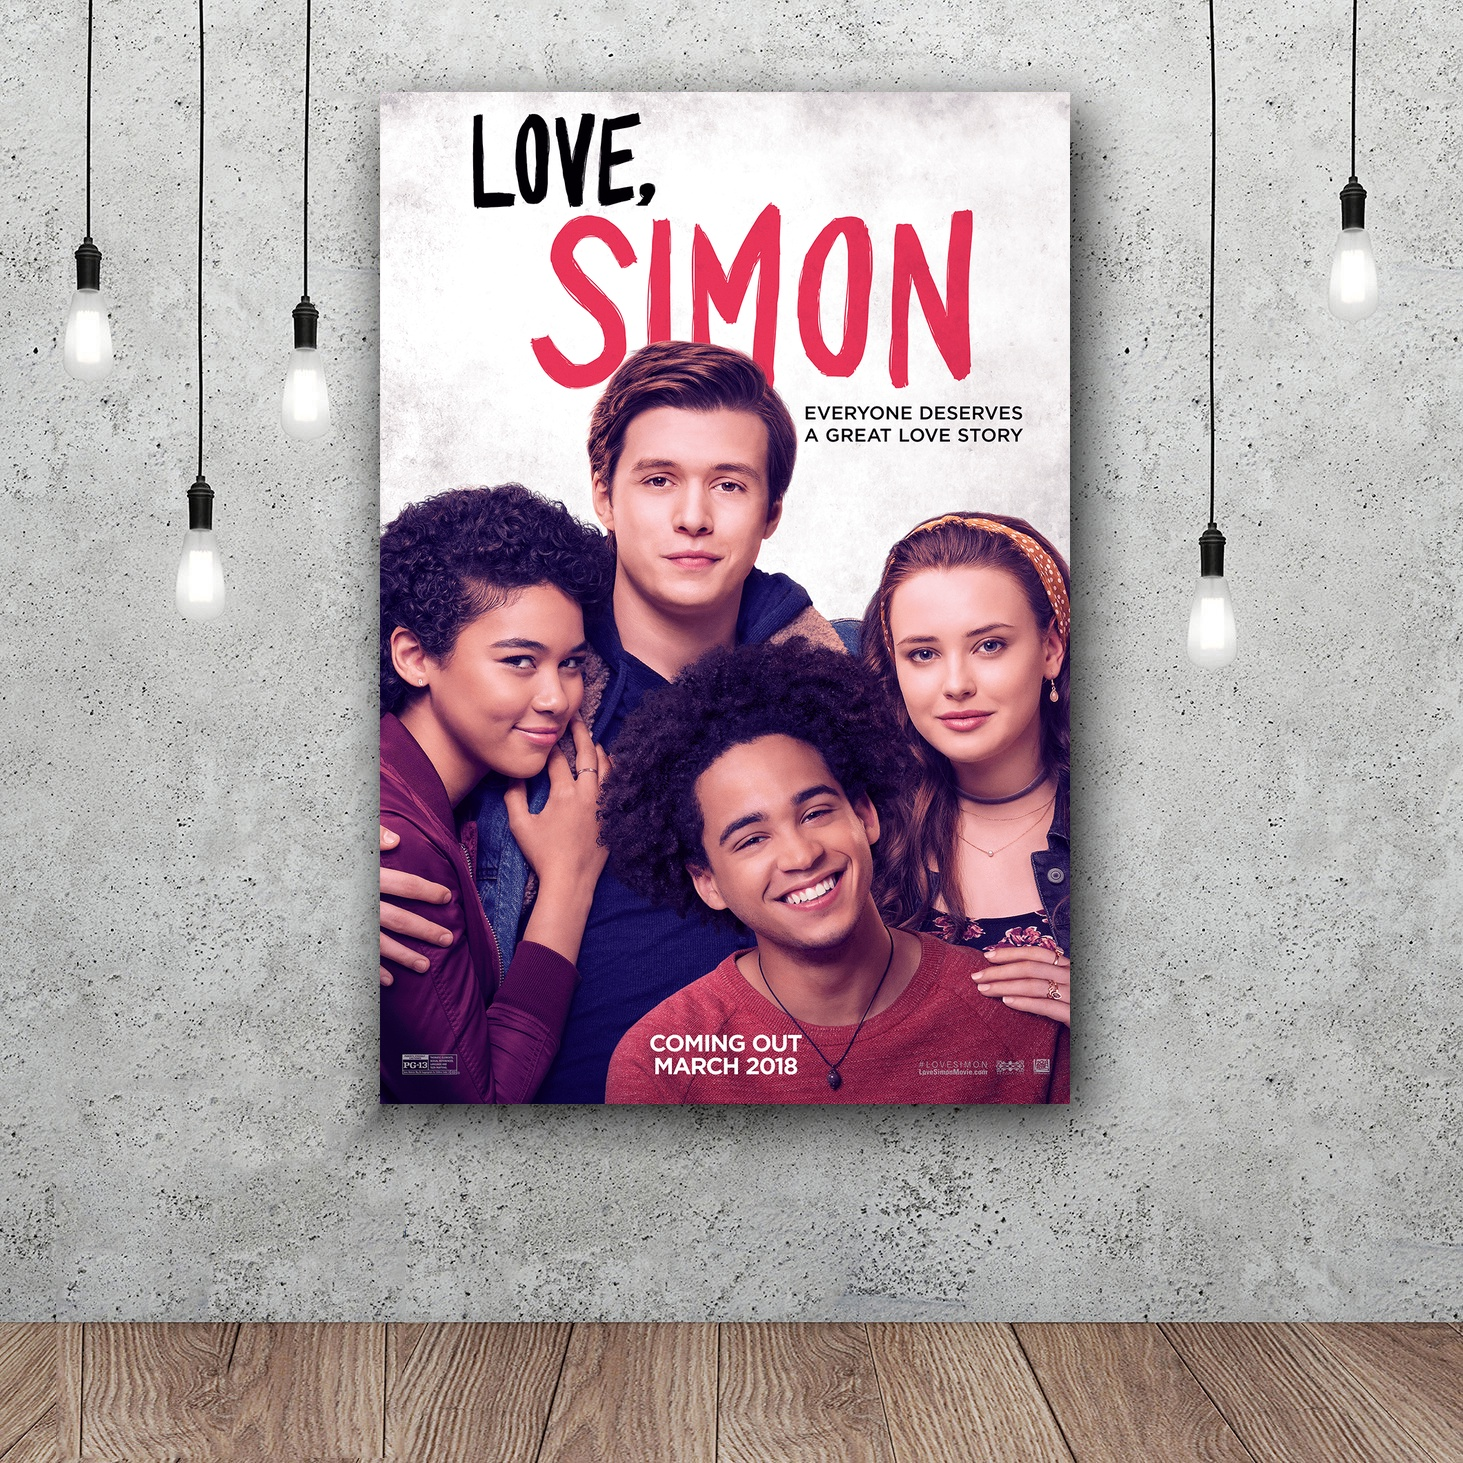 Love, Simon Art Silk Poster Home Decor 12x18 24x36inch